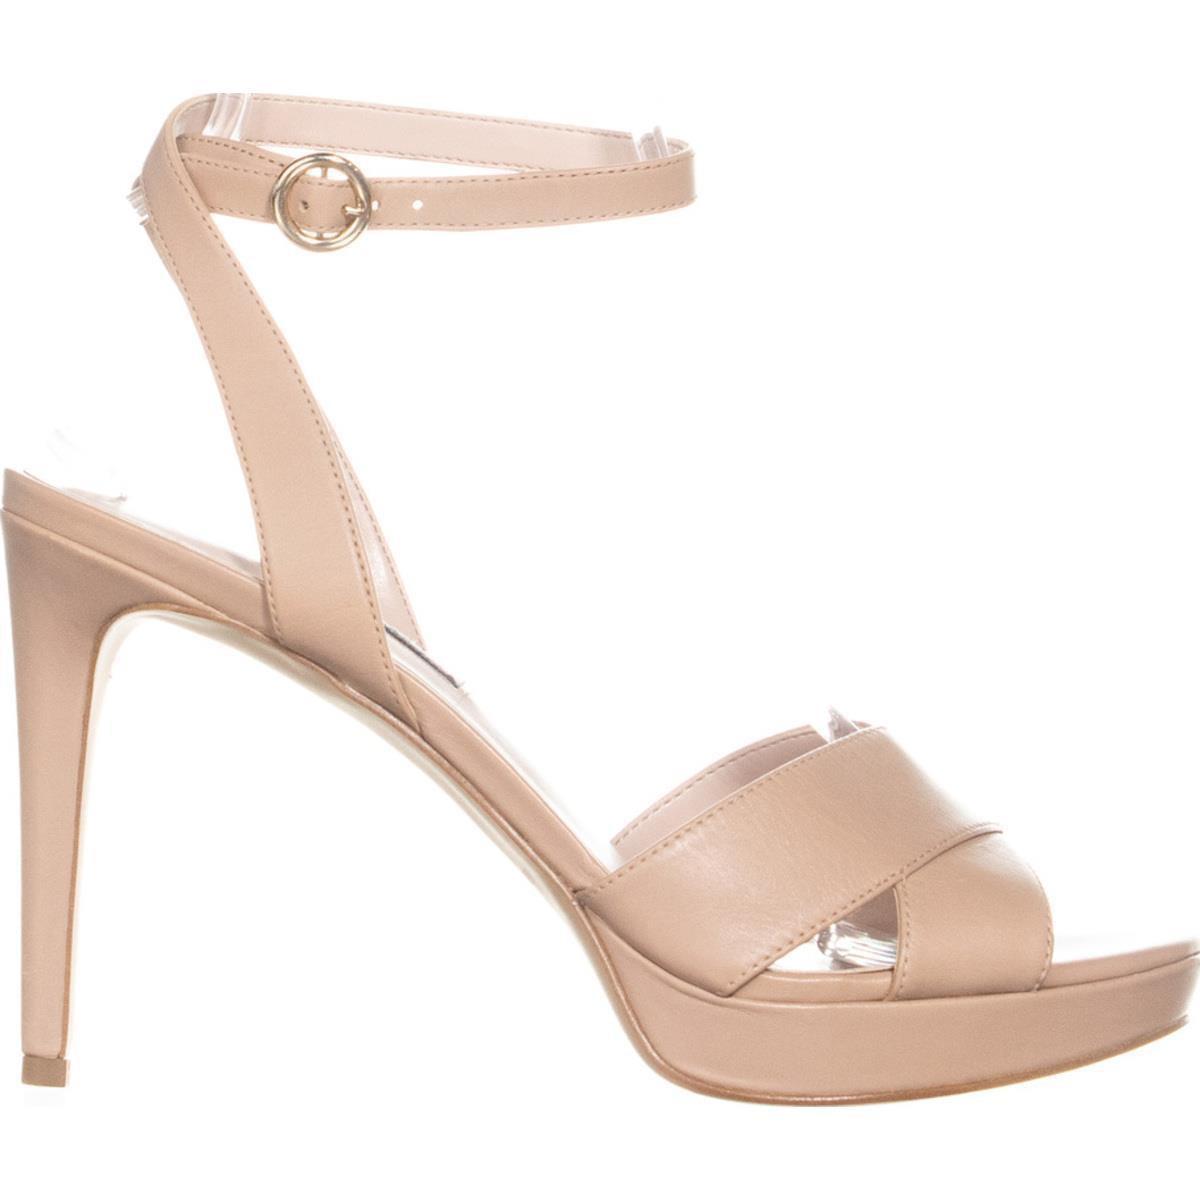 ec93aff2d72 Nine West Quisha Criss Cross Ankle Strap Sandals in Natural - Lyst